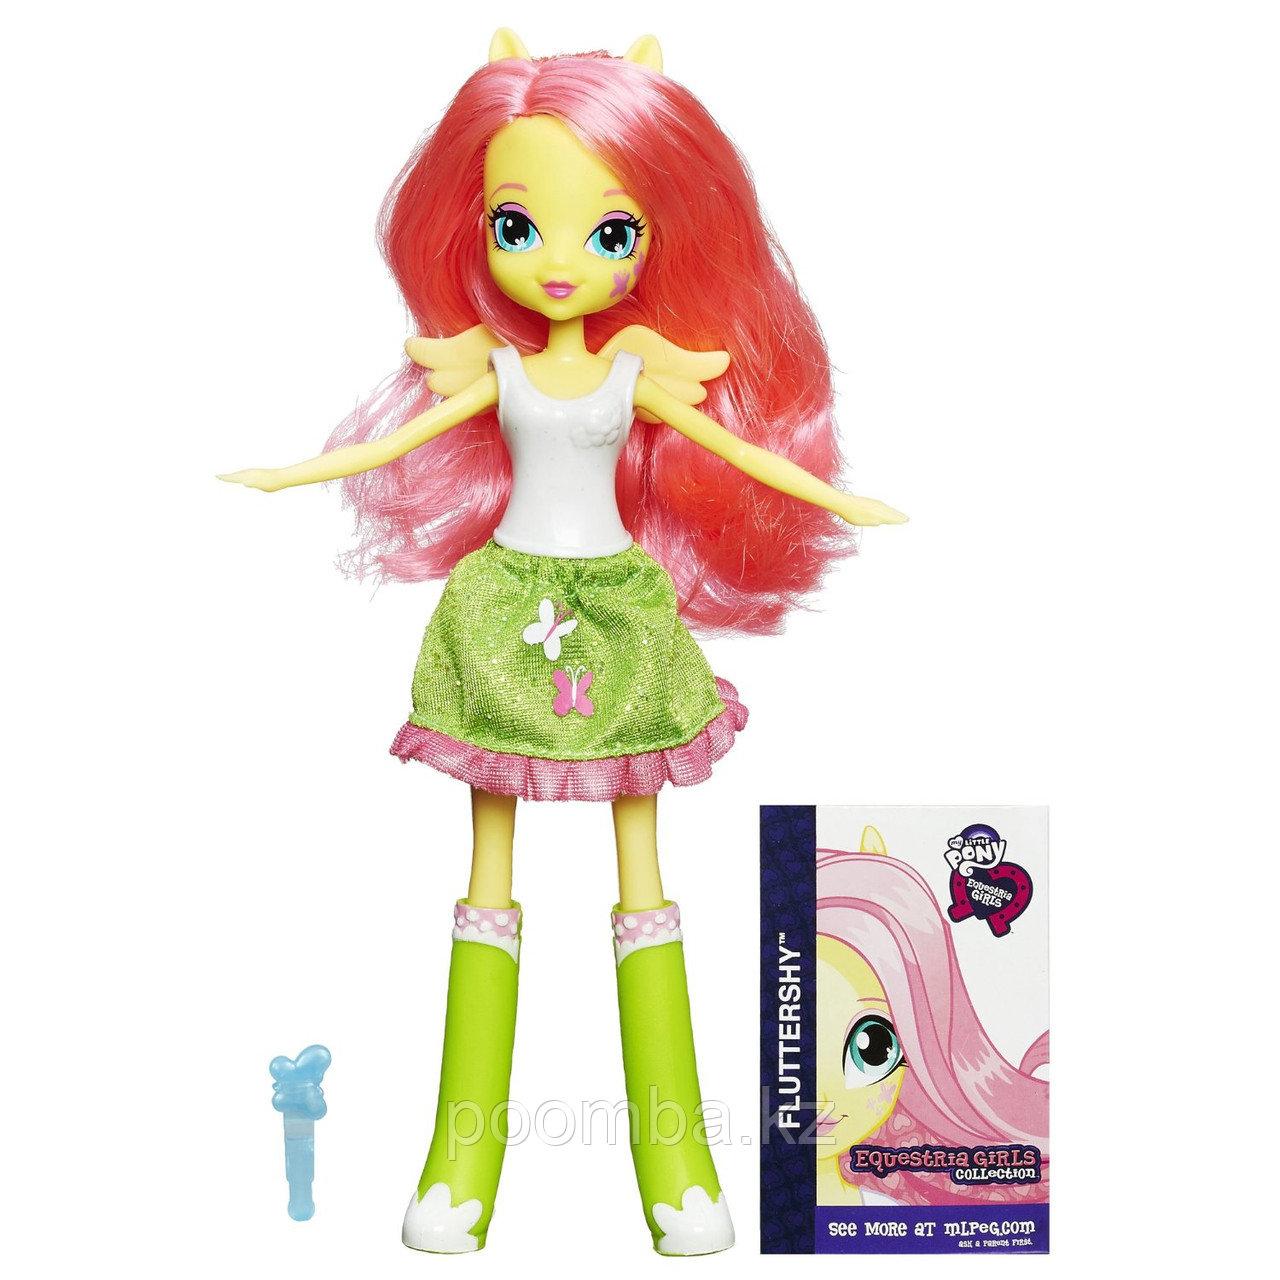 Кукла My Little Pony Equestria Girls - Флаттершай в зеленых сапожках